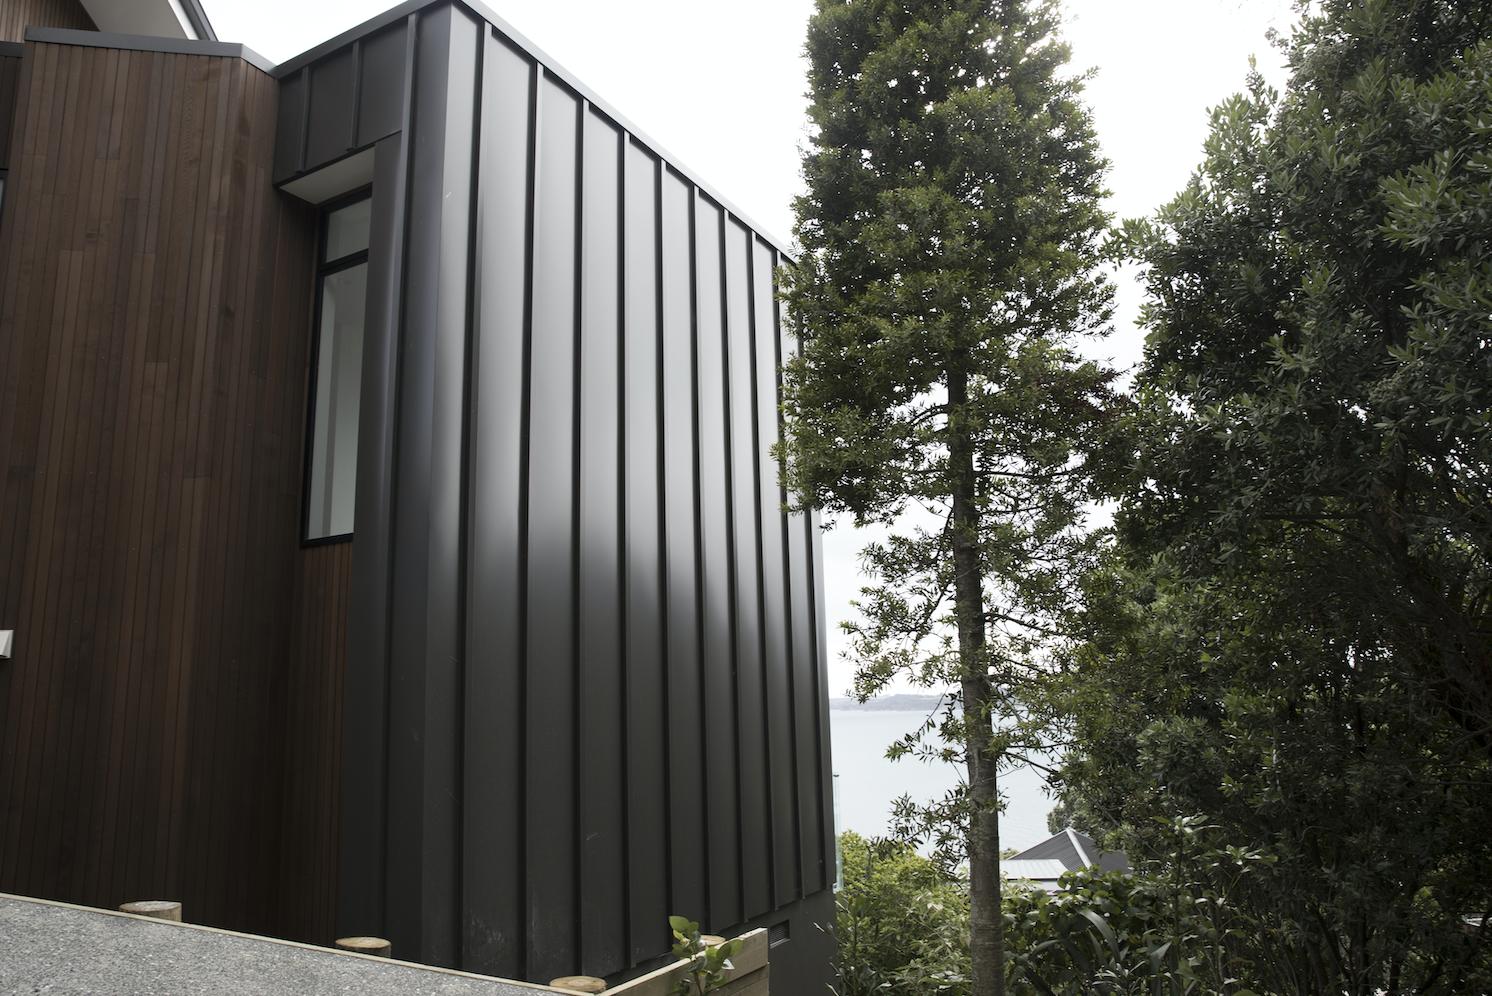 The-Roofing-Store-Steel-Metal-Standing-Seam-Batten-Cap-Virtor+-ZX-Ironsand-1-LR.png